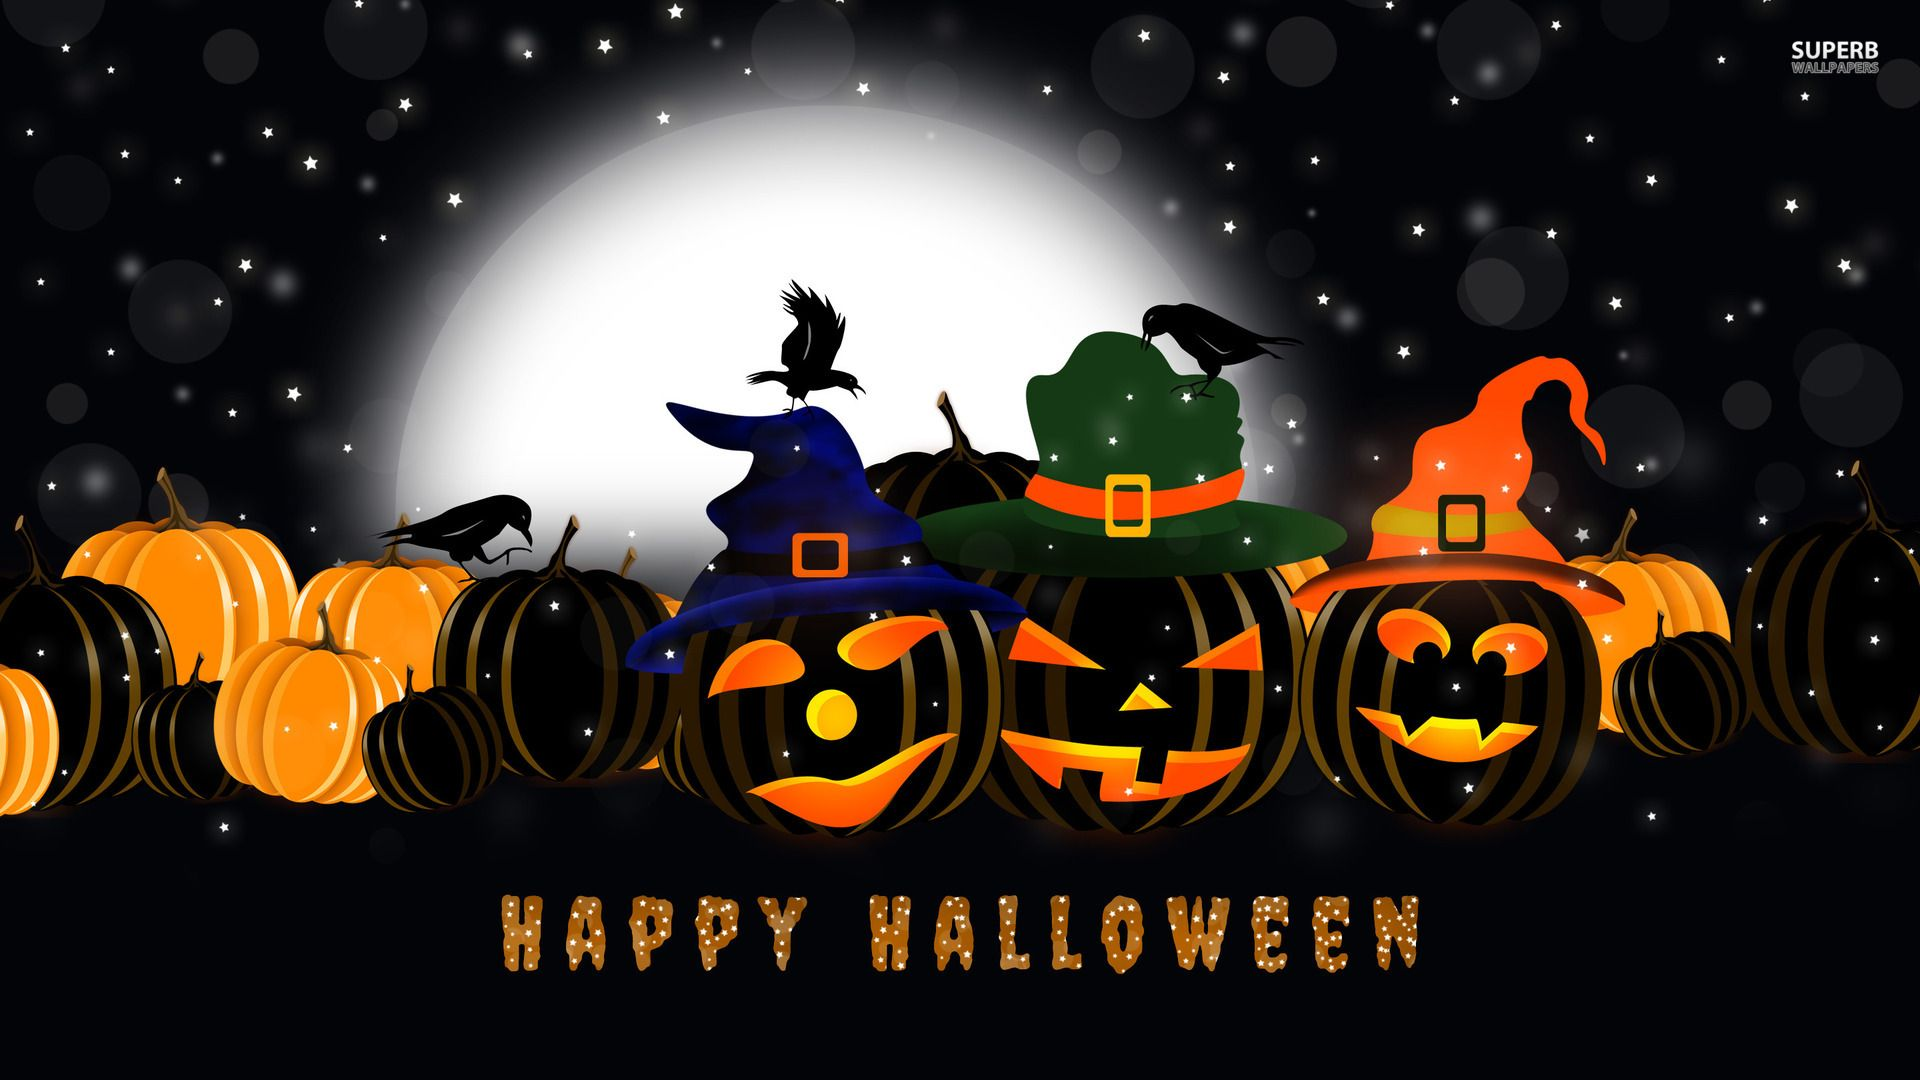 Halloween-Facebook-cover-full-hd